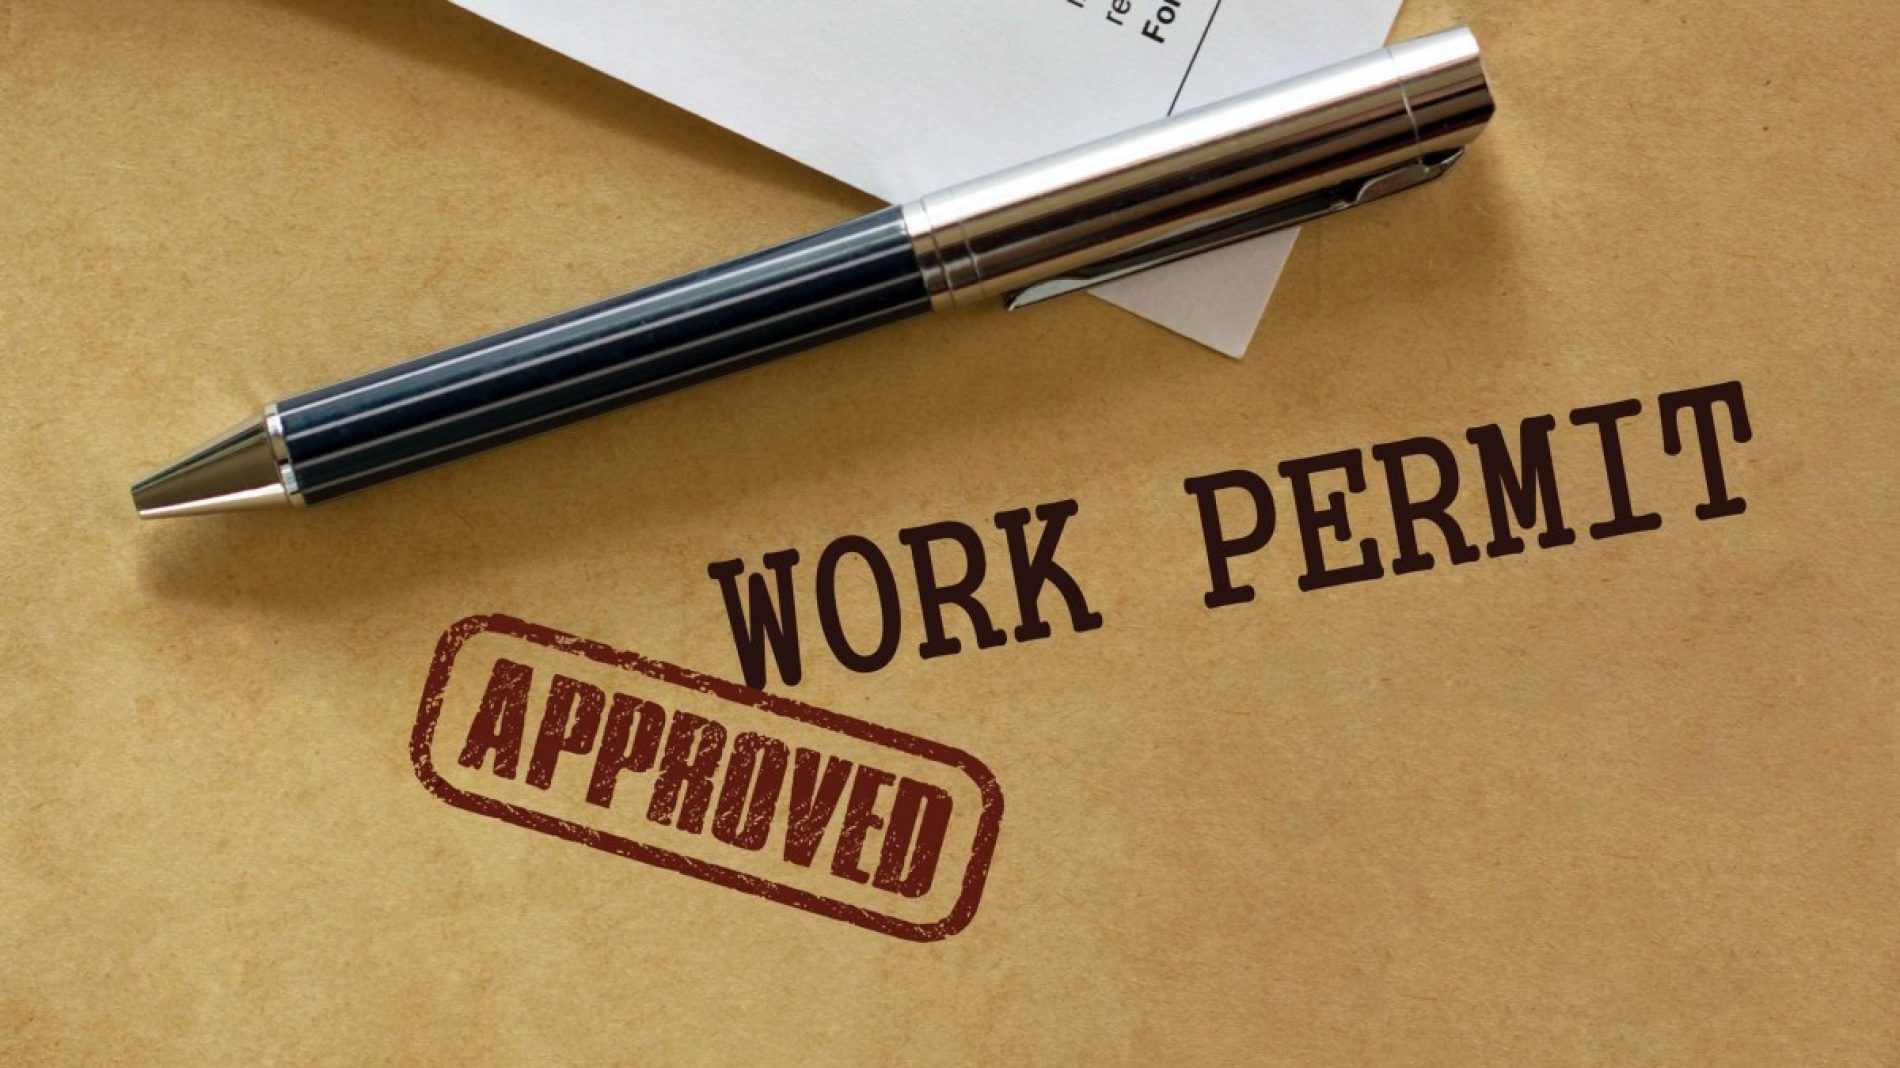 workpermitvisa